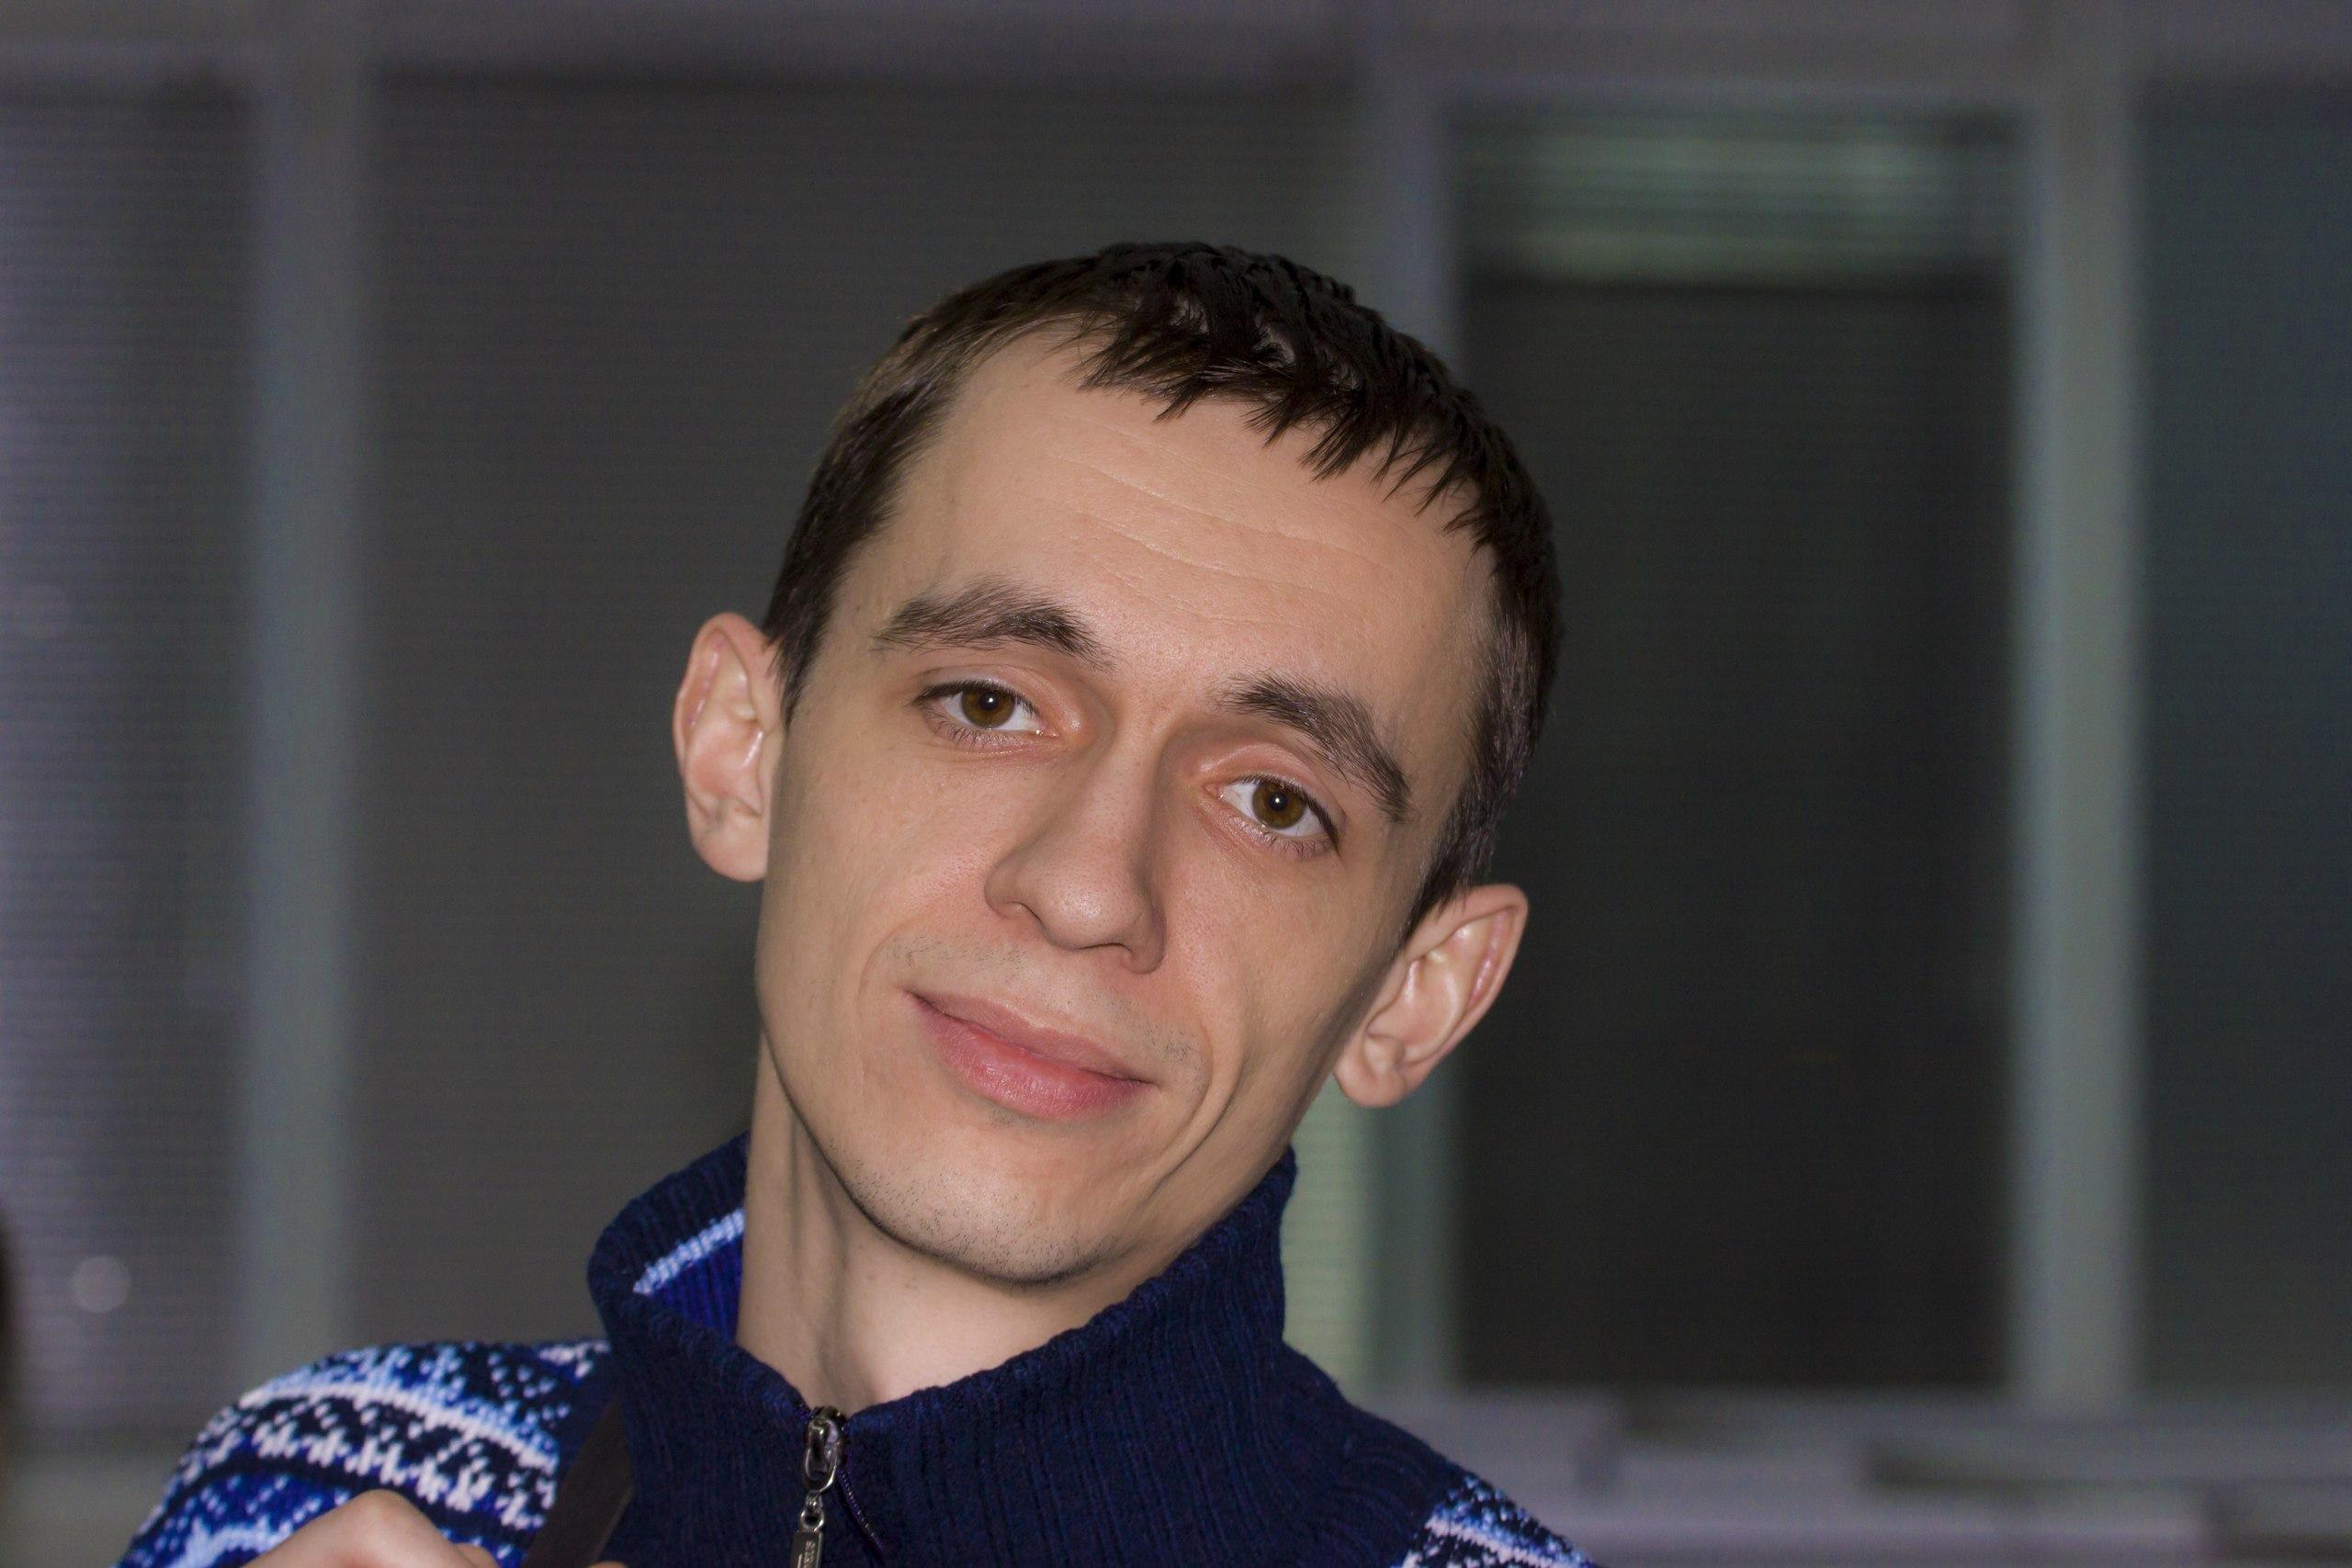 Alexey Kutyrev